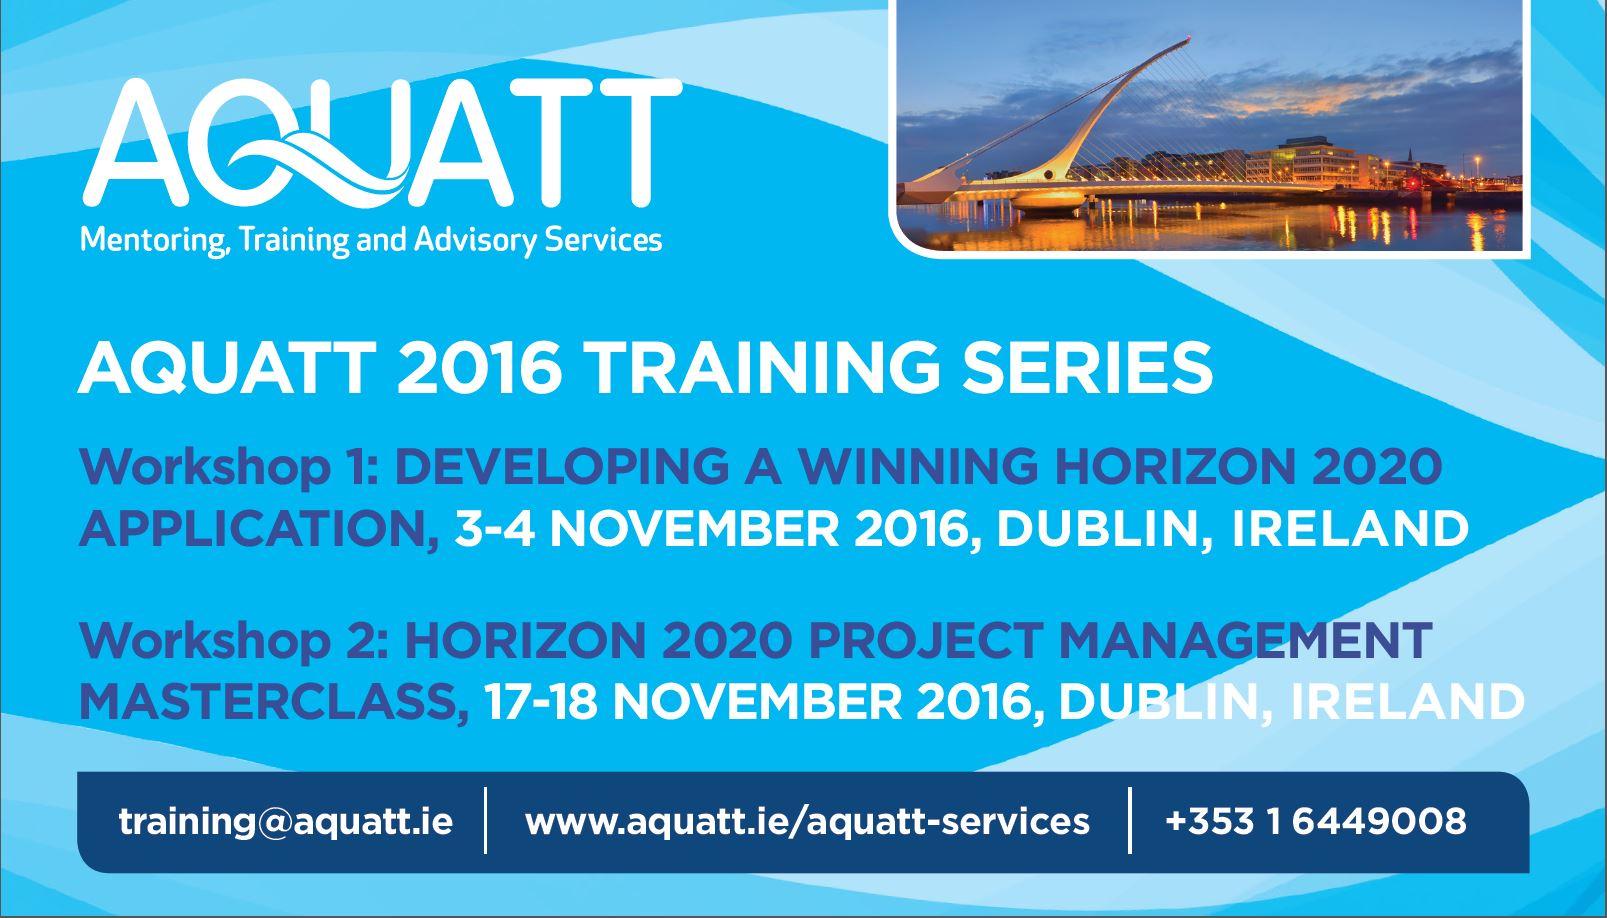 AquaTT Training Courses